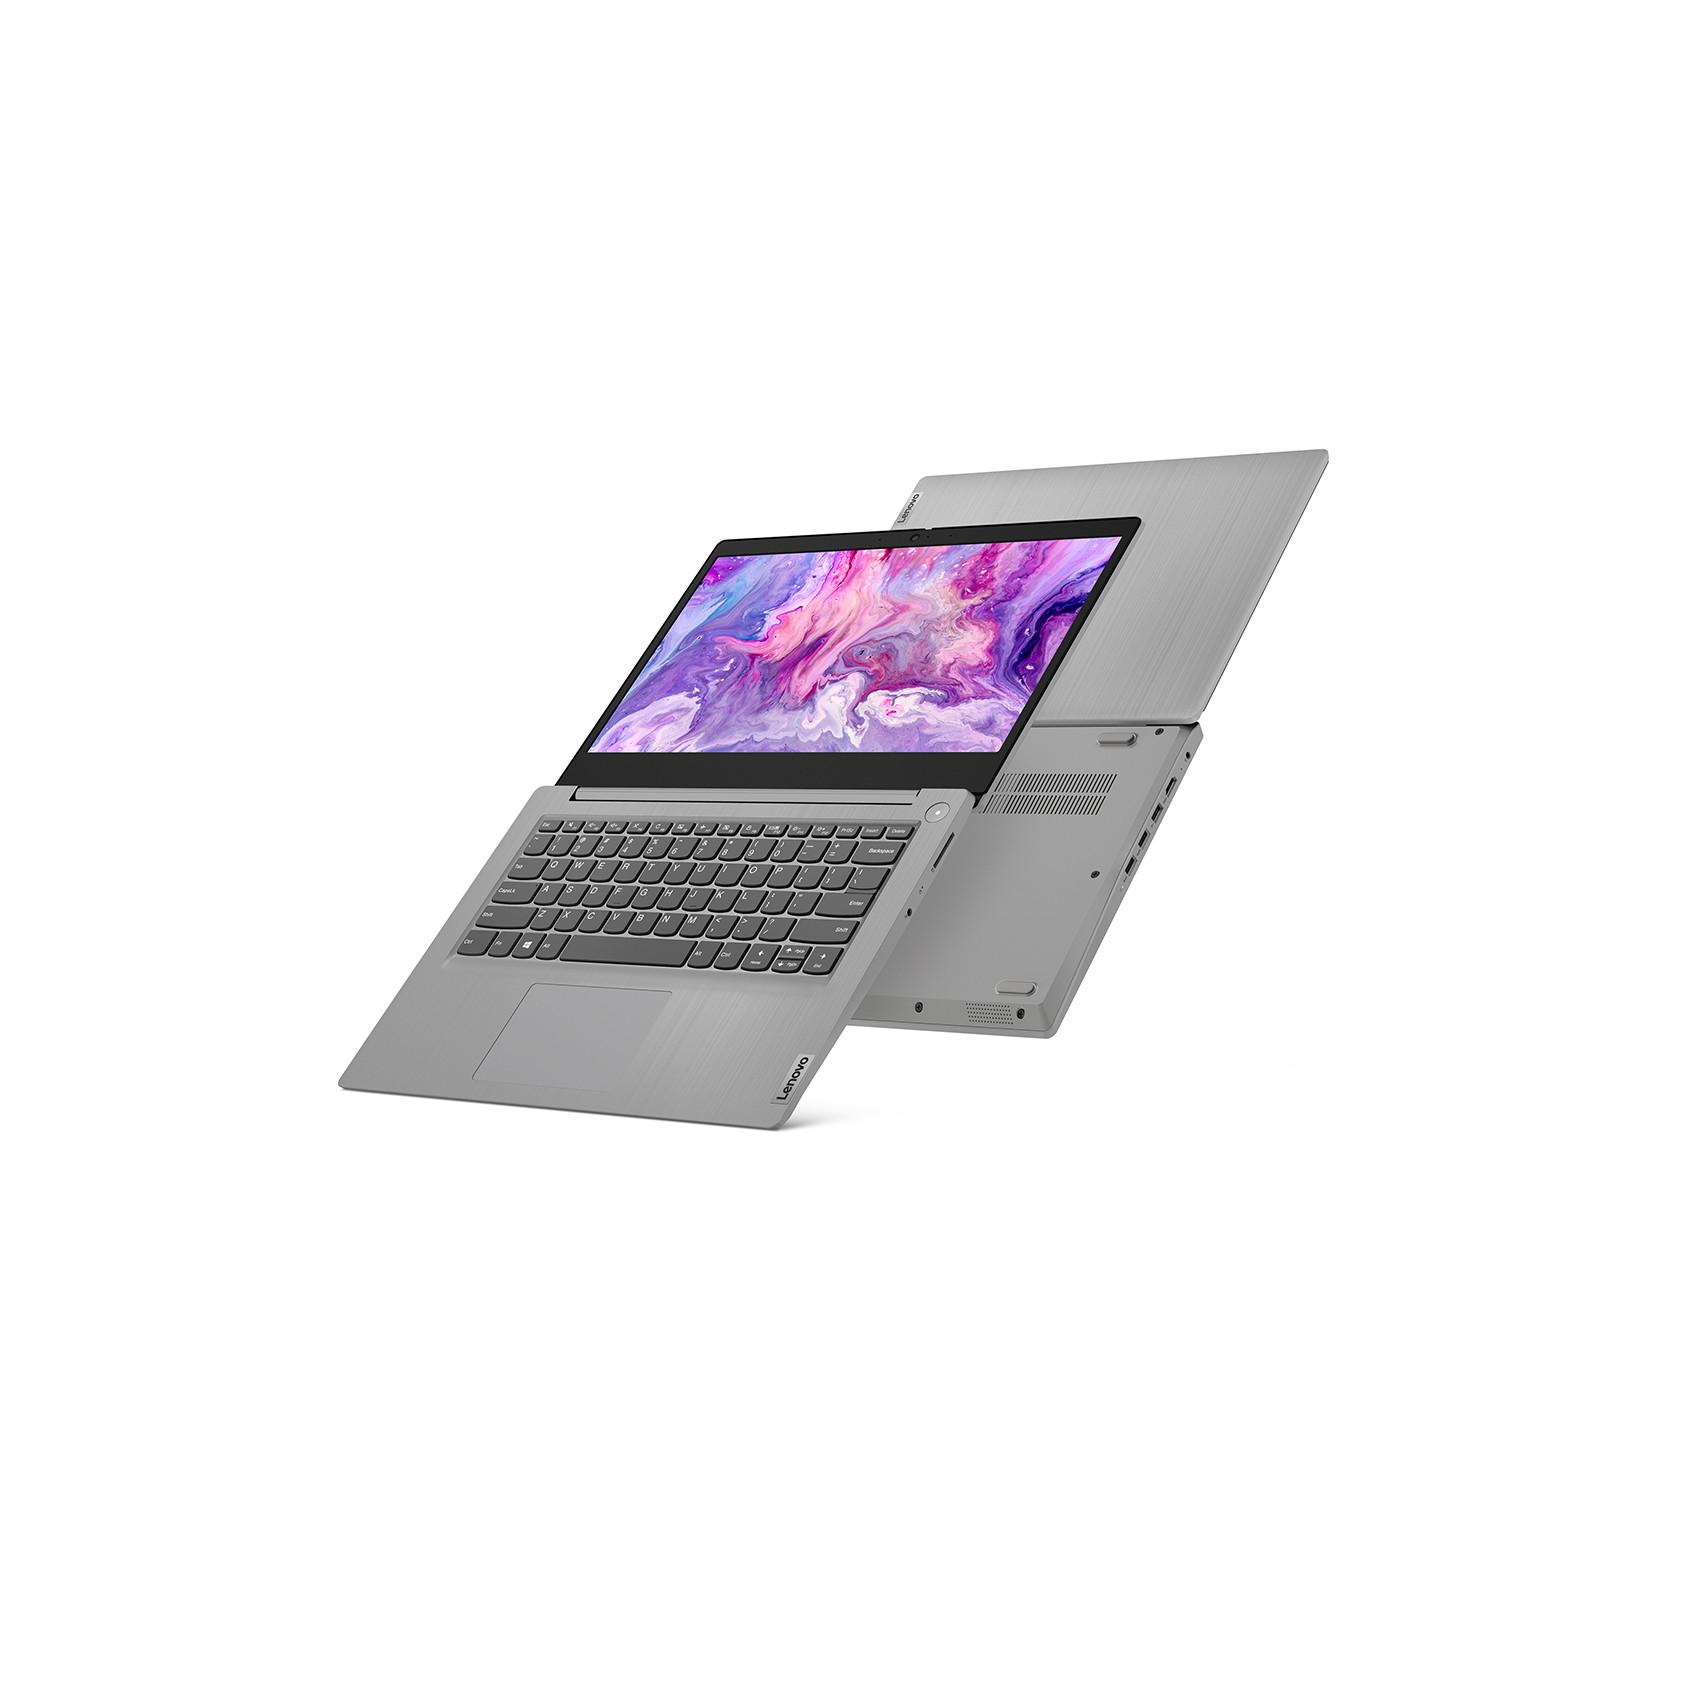 Laptop Lenovo Ideapad 3-14IIL05 Core i5-1035G1 / RAM 8GB / SSD 512GB / 14 inch FHD / Win 10 / Grey - Hàng Nhập Khẩu Mỹ